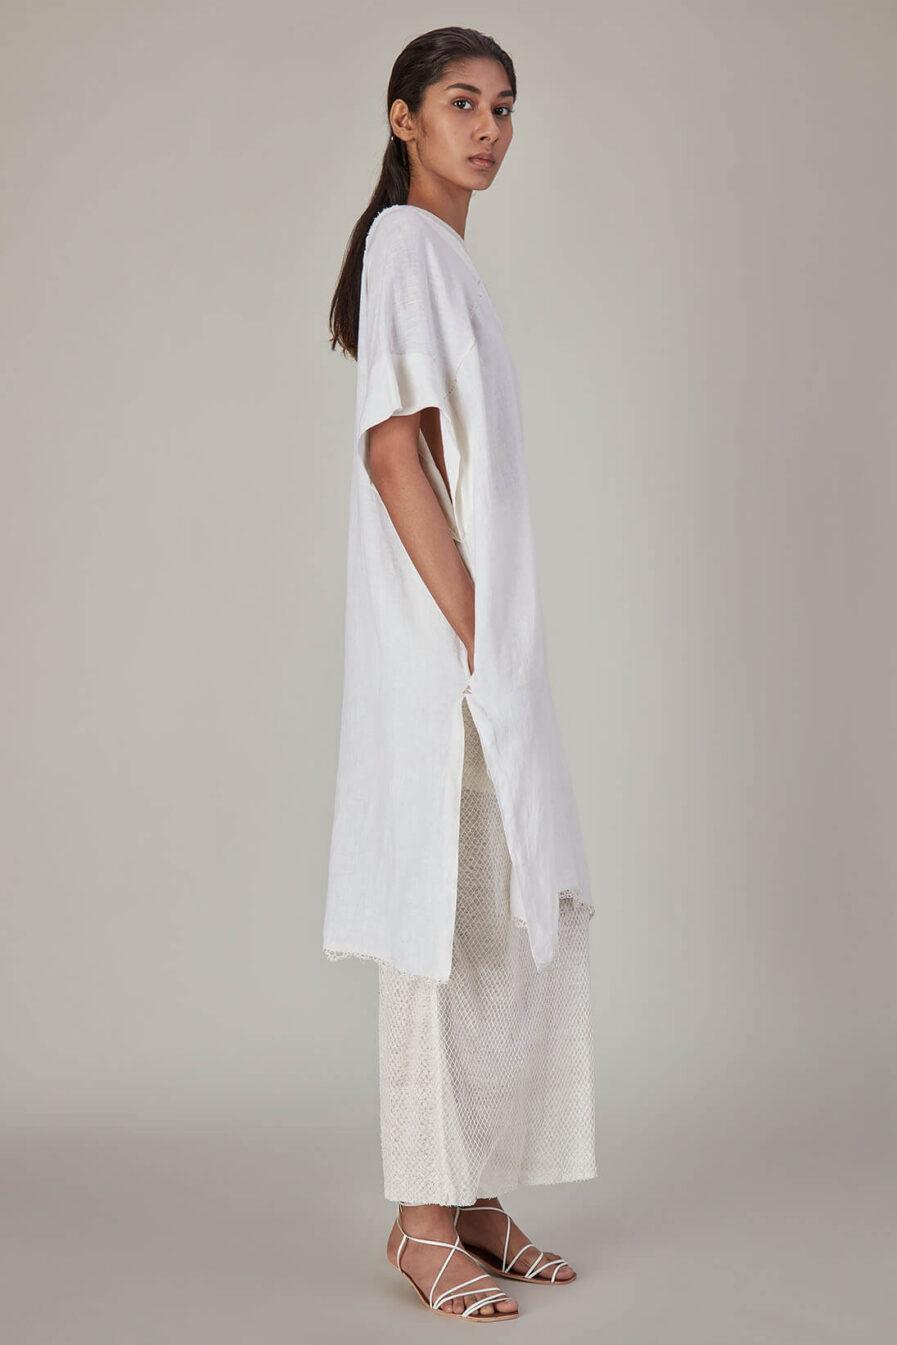 Anavila Ivory Linen Tunic